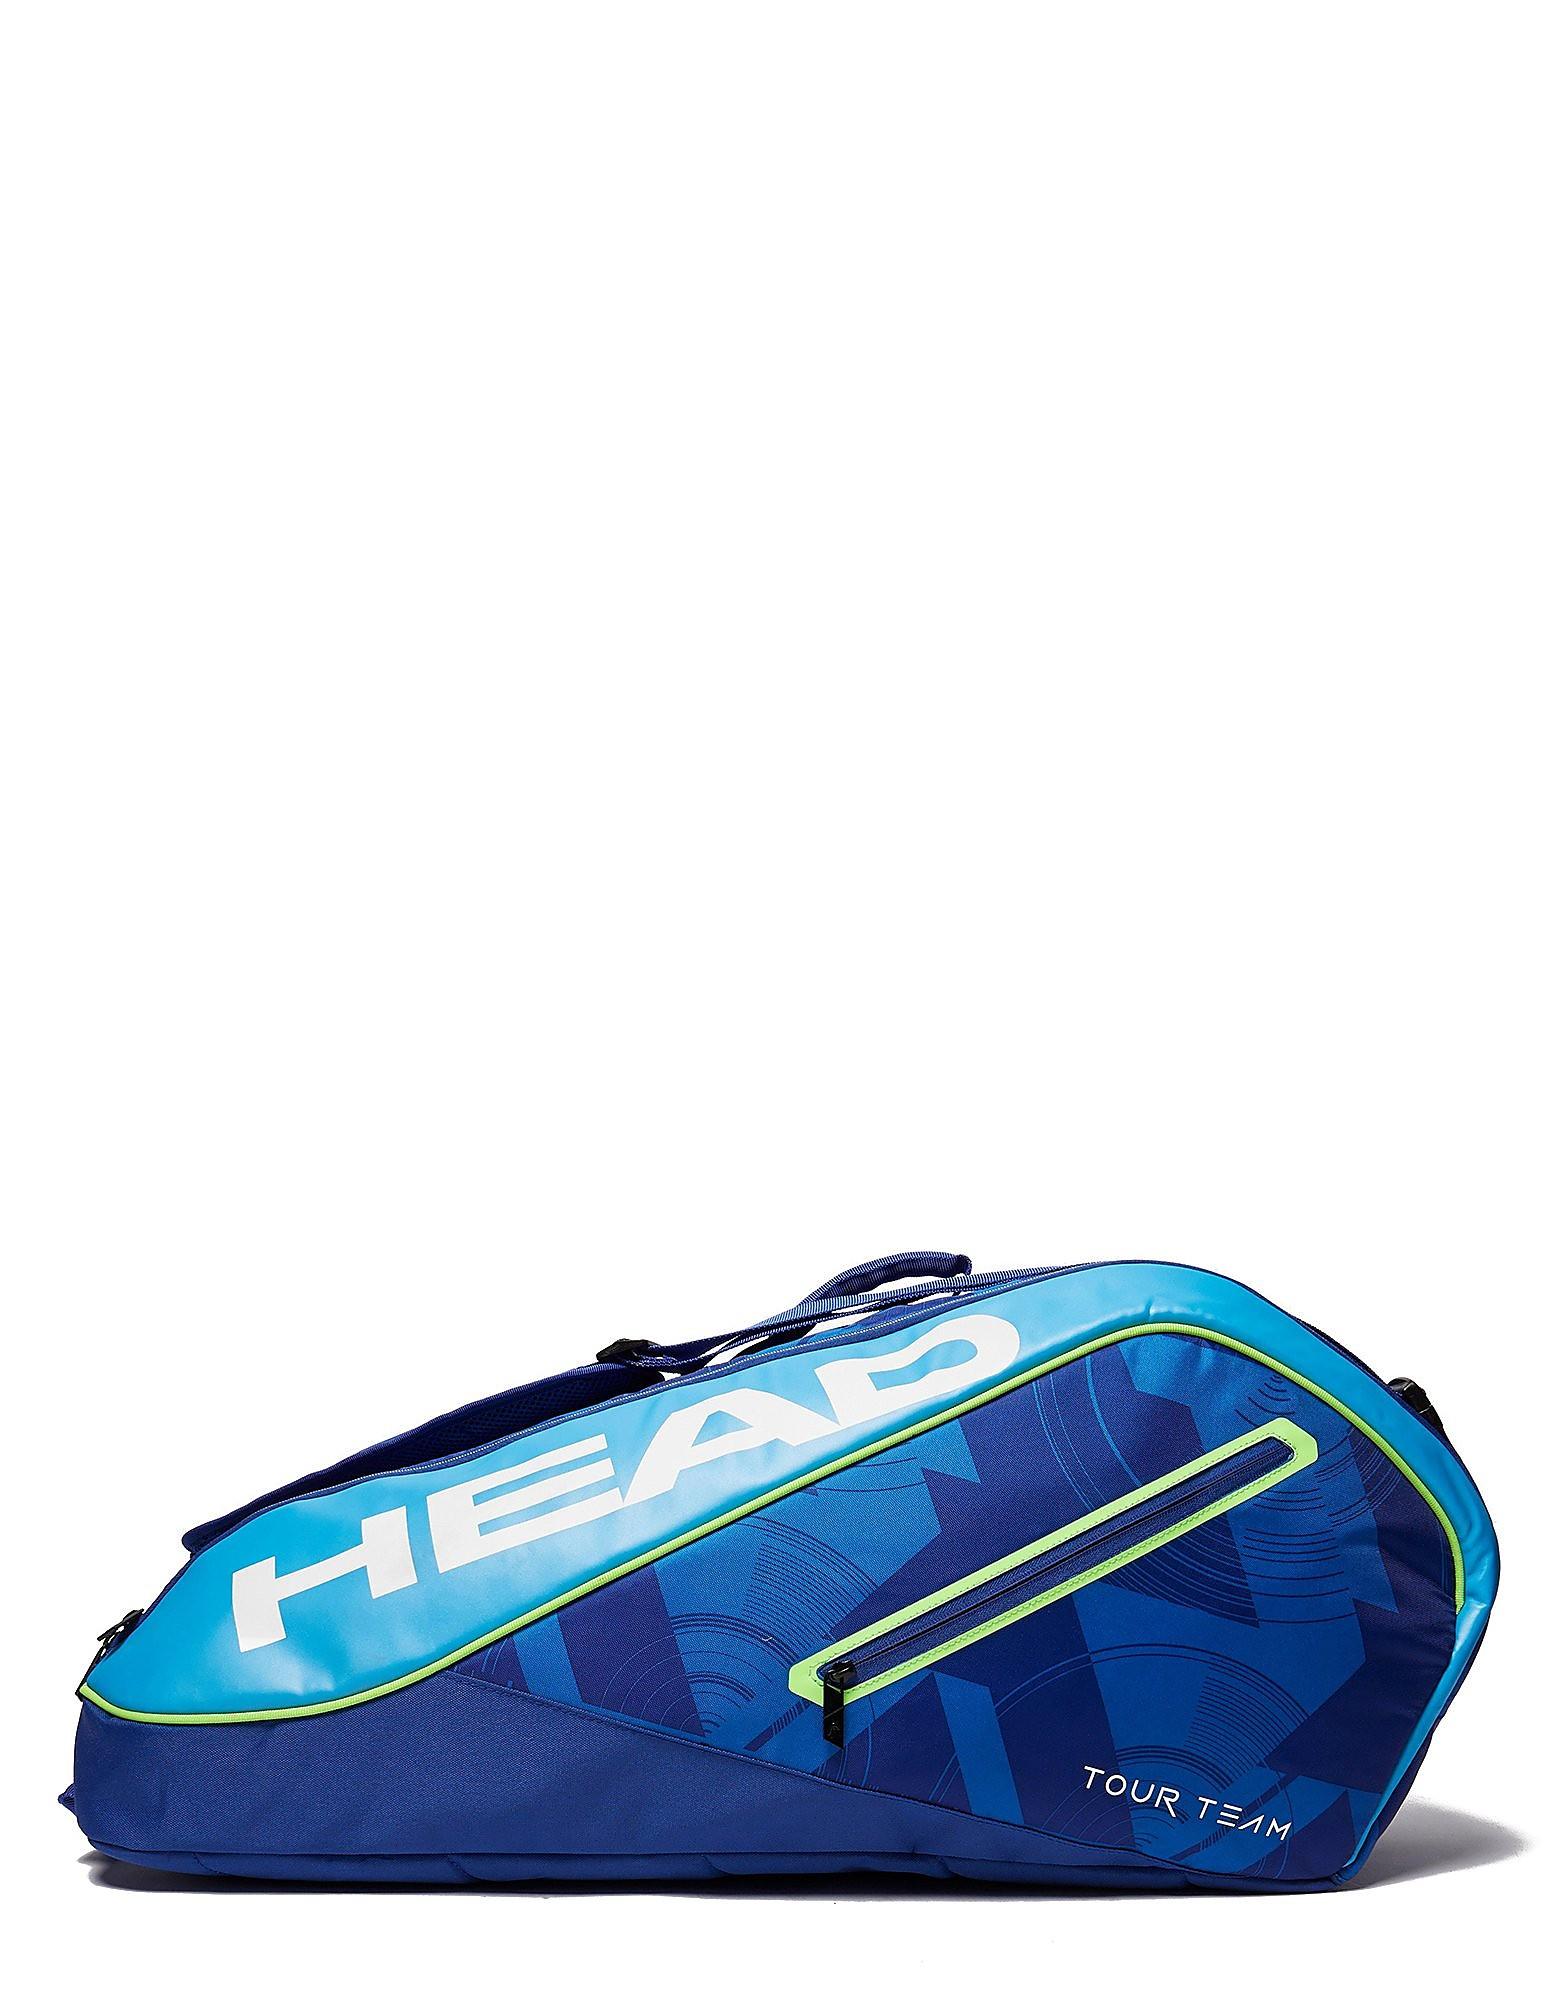 Head Tour Team 6R Combi Racketbag